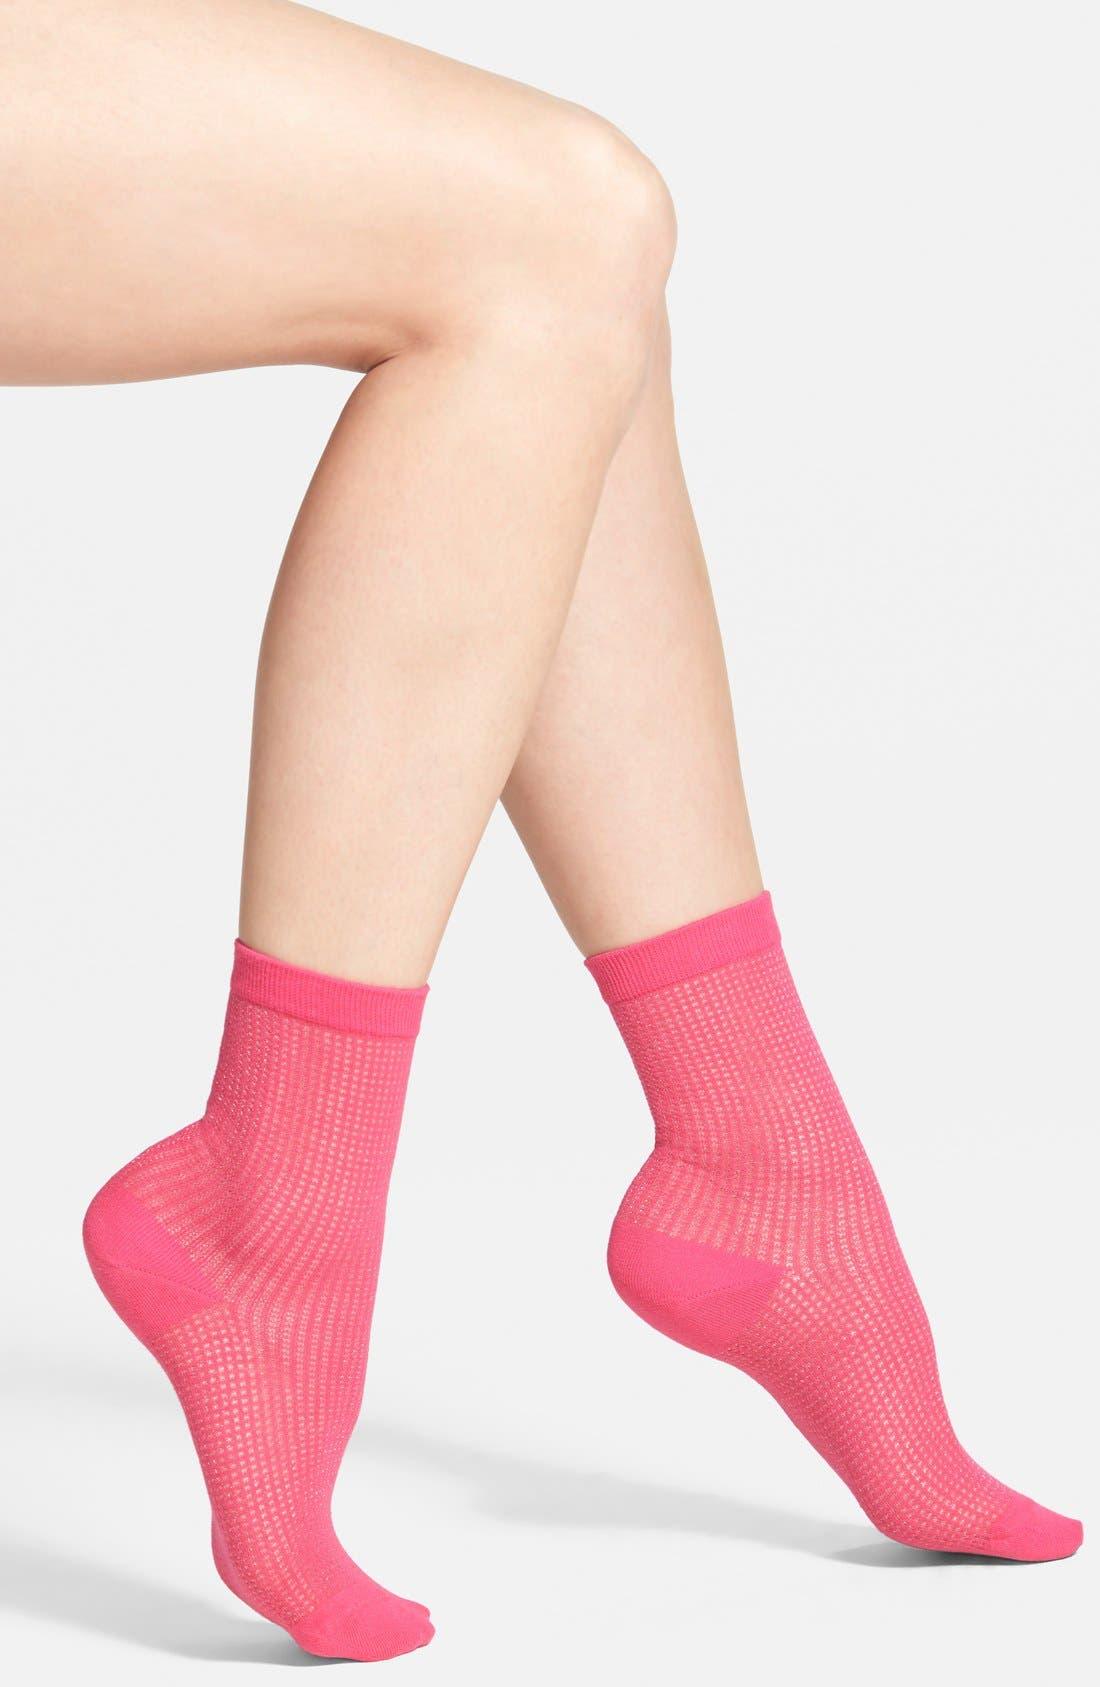 Alternate Image 1 Selected - kate spade new york 'filament caning' trouser socks